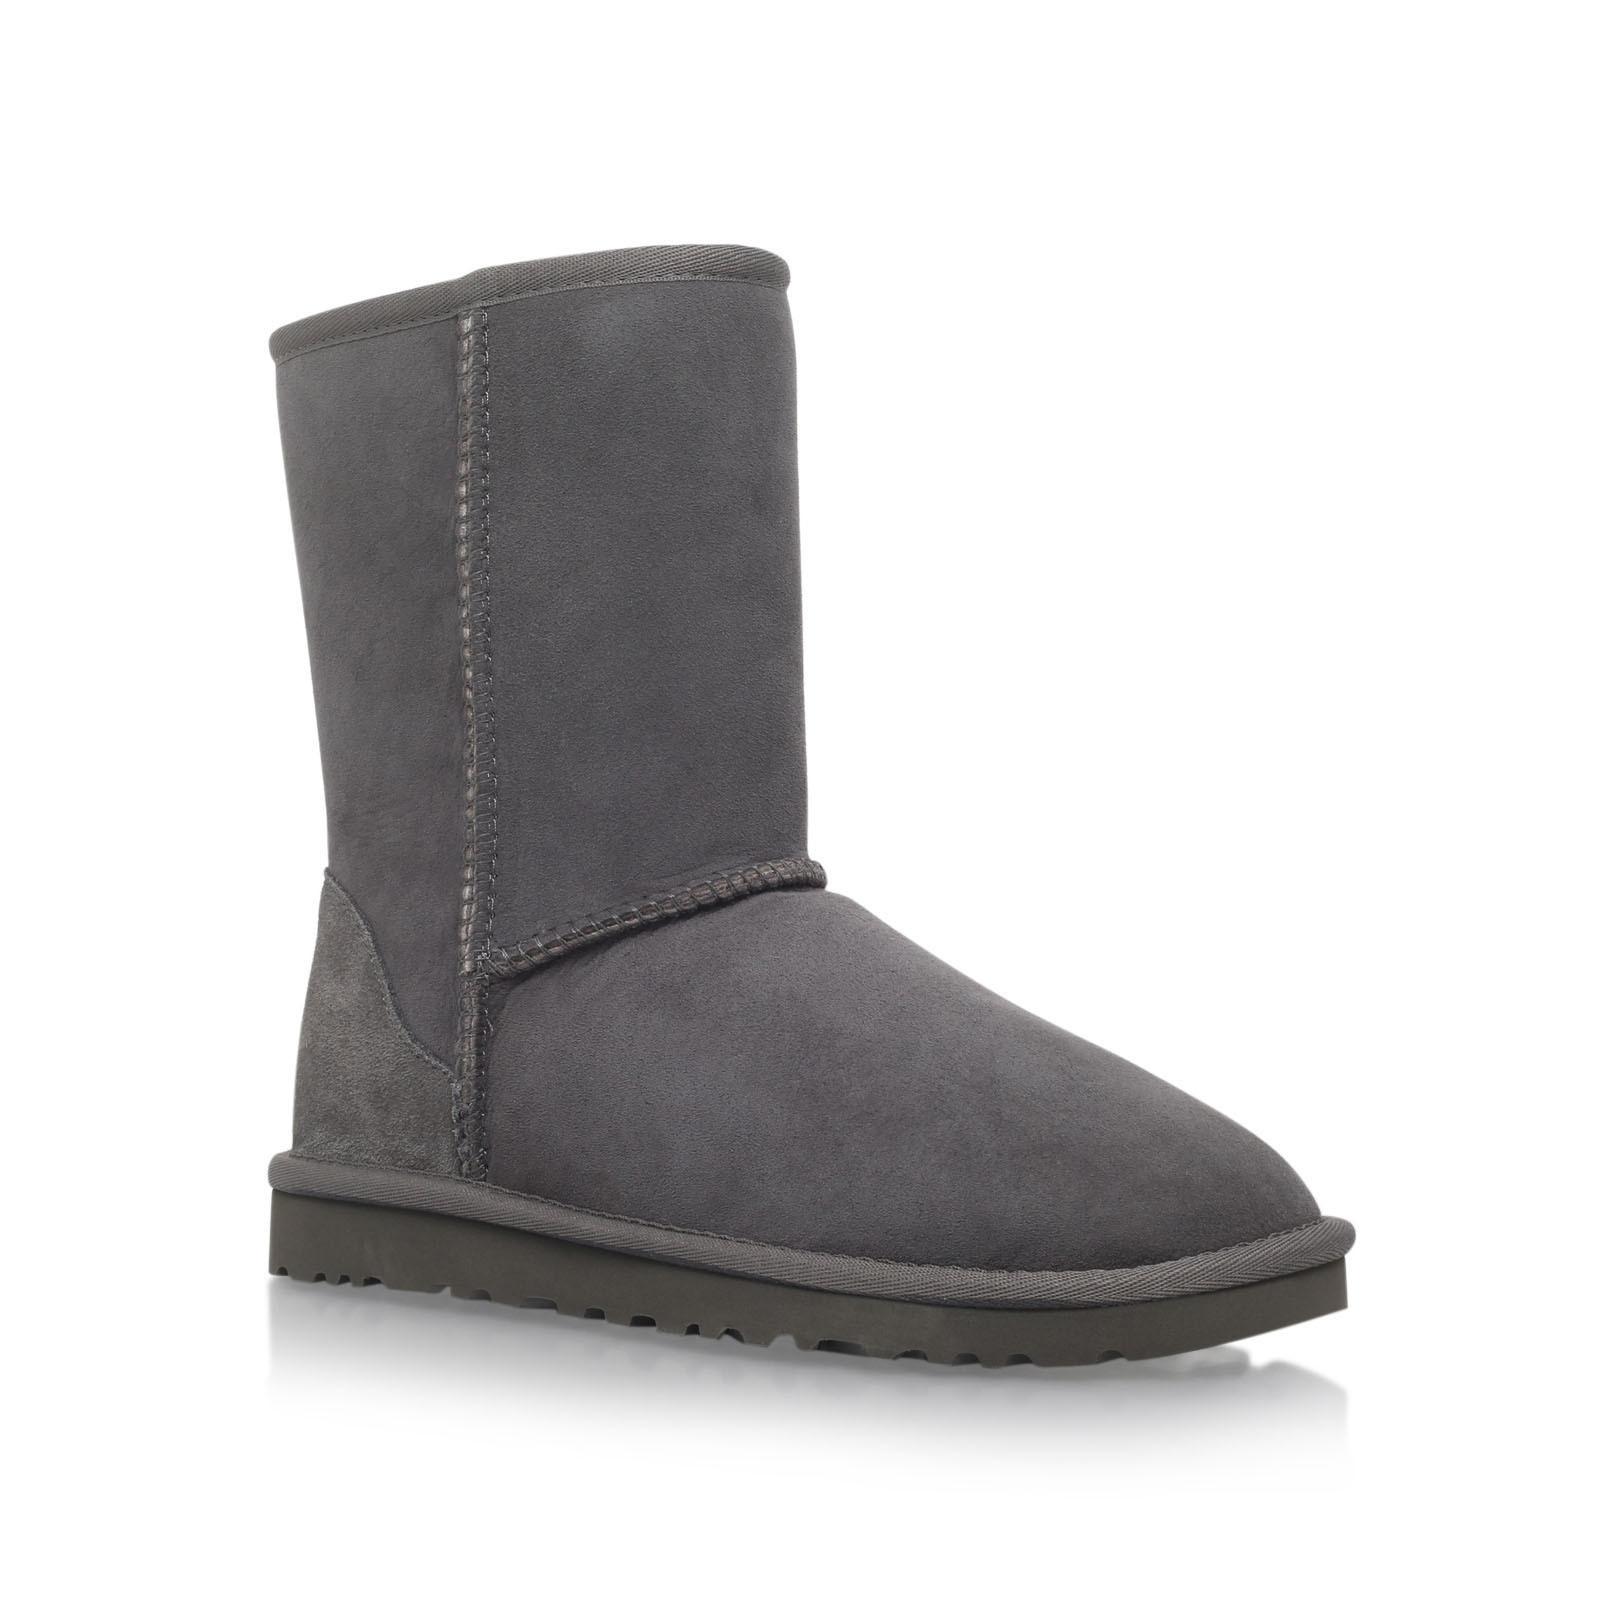 quality design best wholesale outlet Ugg Boots Outlets Melbourne | Mindwise